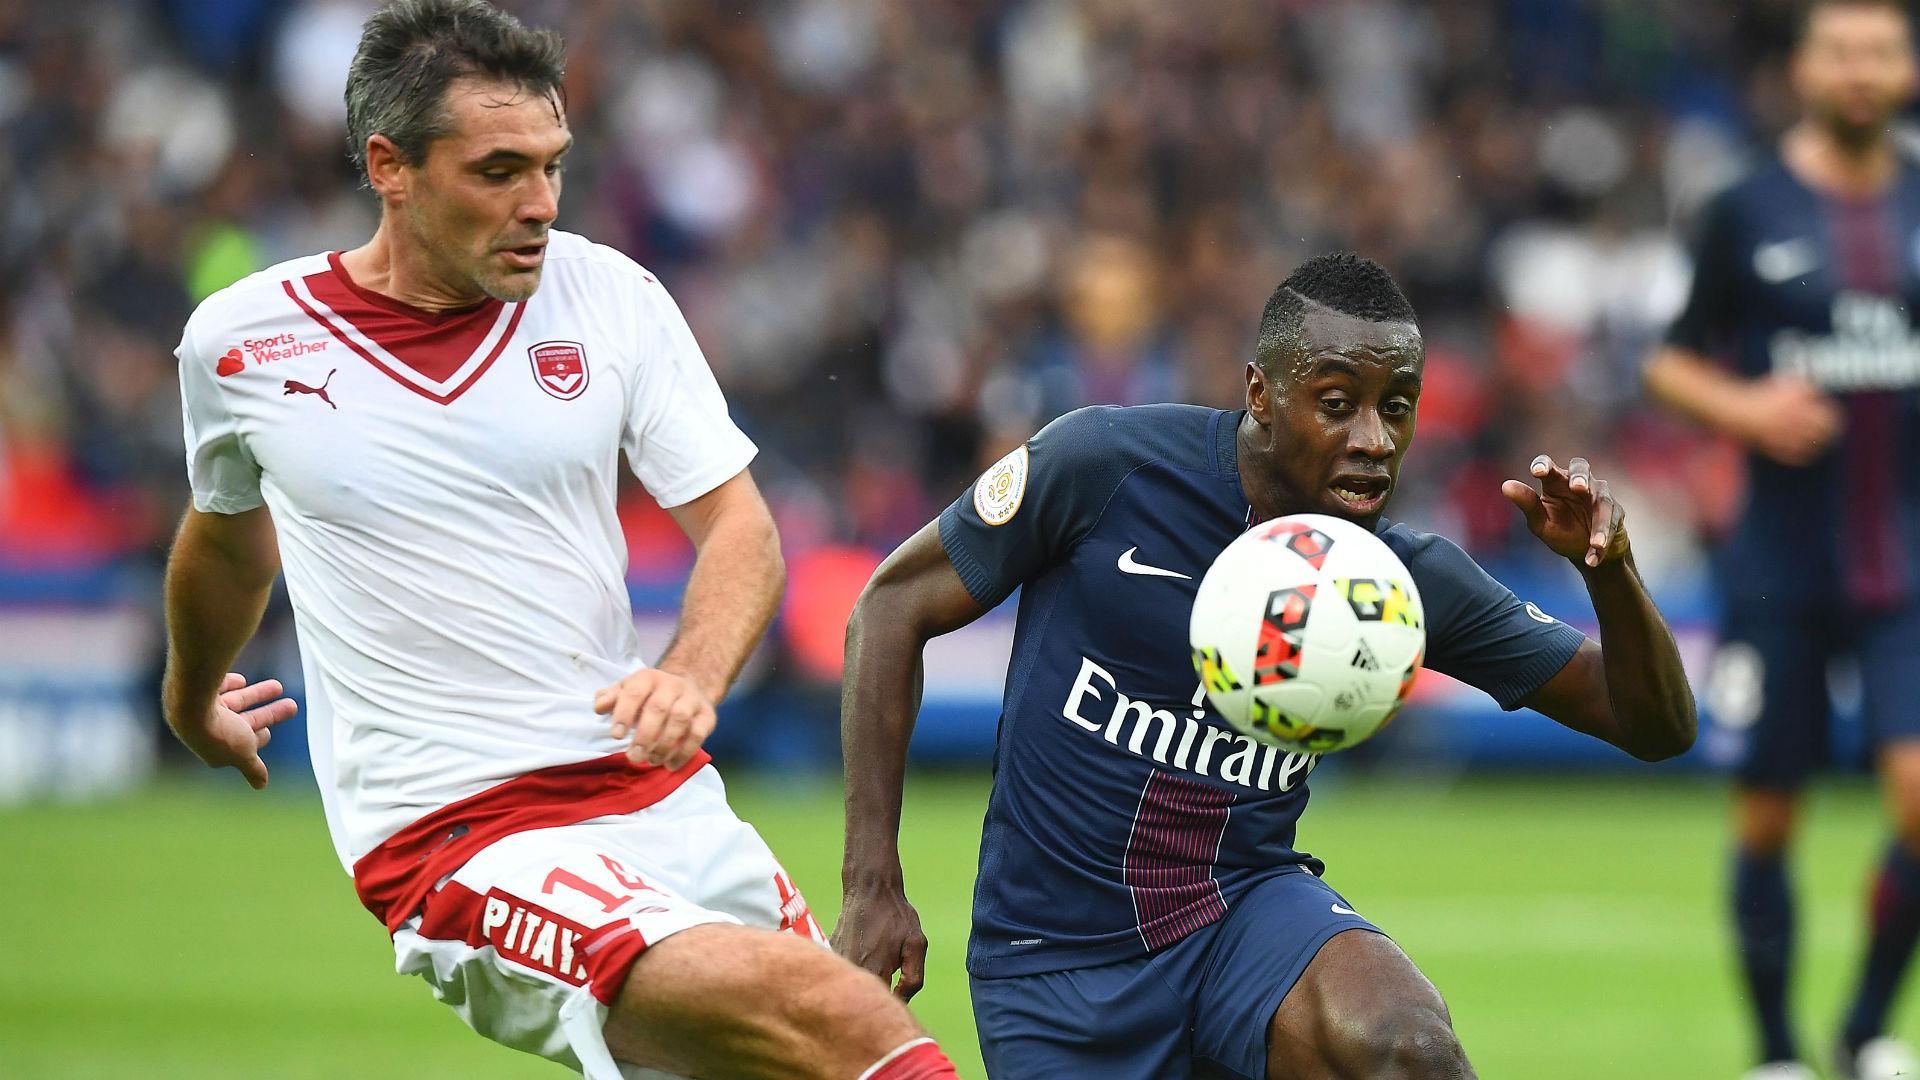 Calciomercato Juventus, si stringe per Witsel già a gennaio